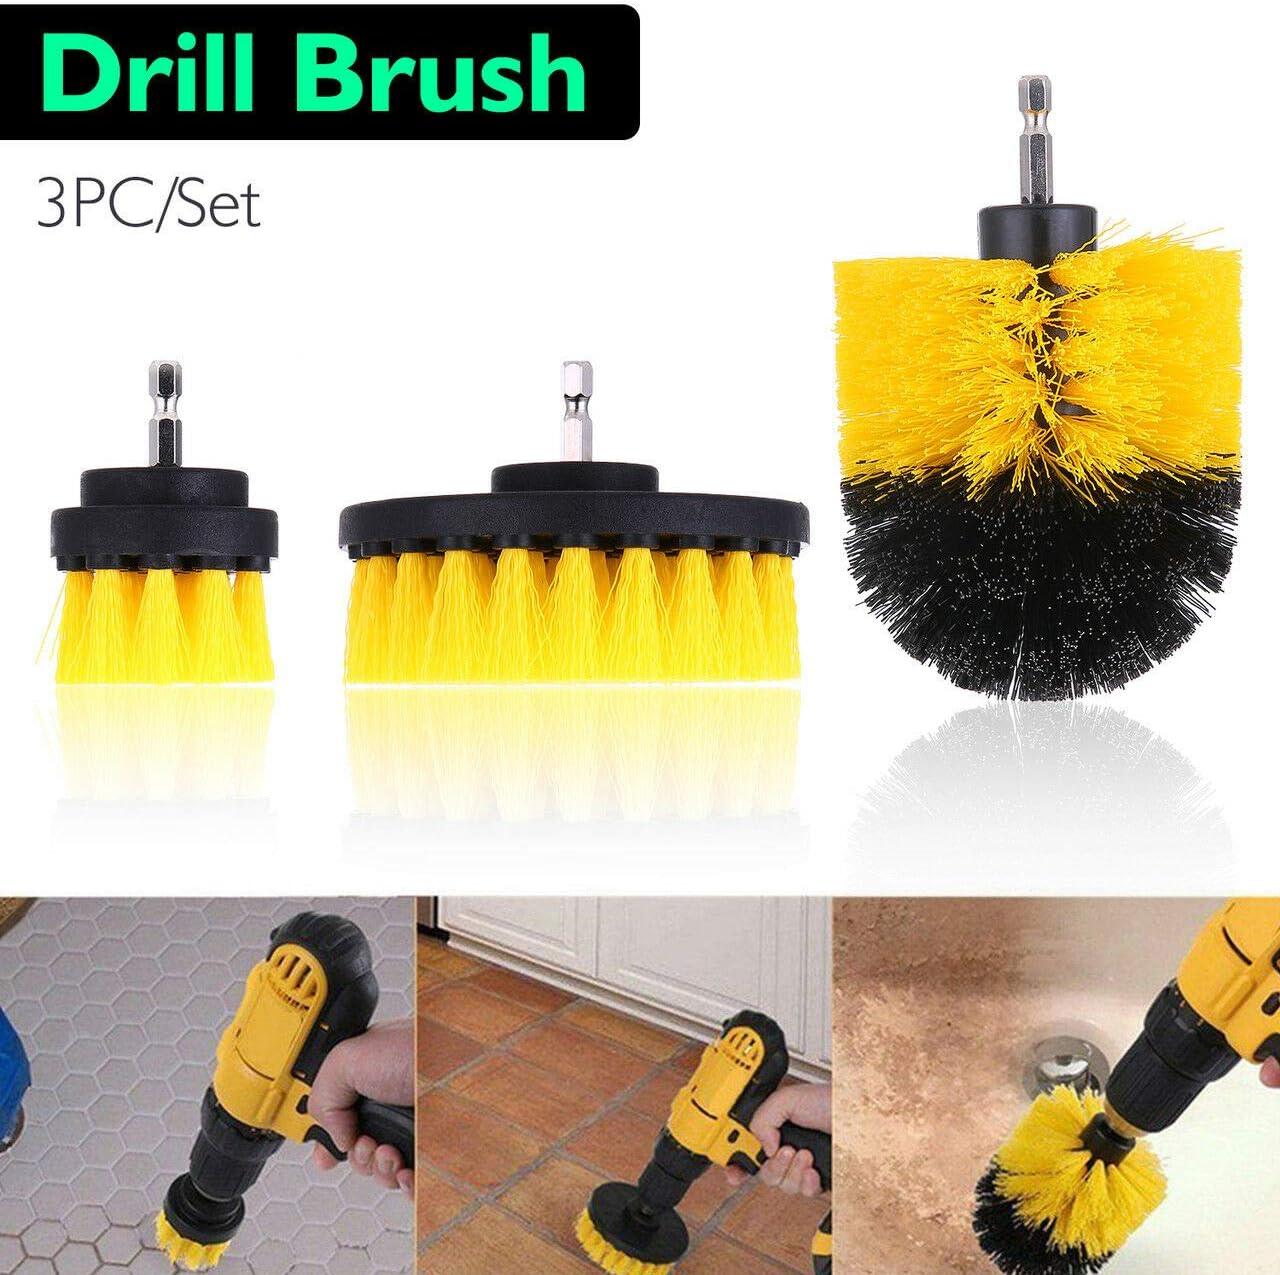 Klad-Shop 3pcs Power Scrubber Soft Drill Brush Set for Car Carpet Wall Tile Grout Cleaning